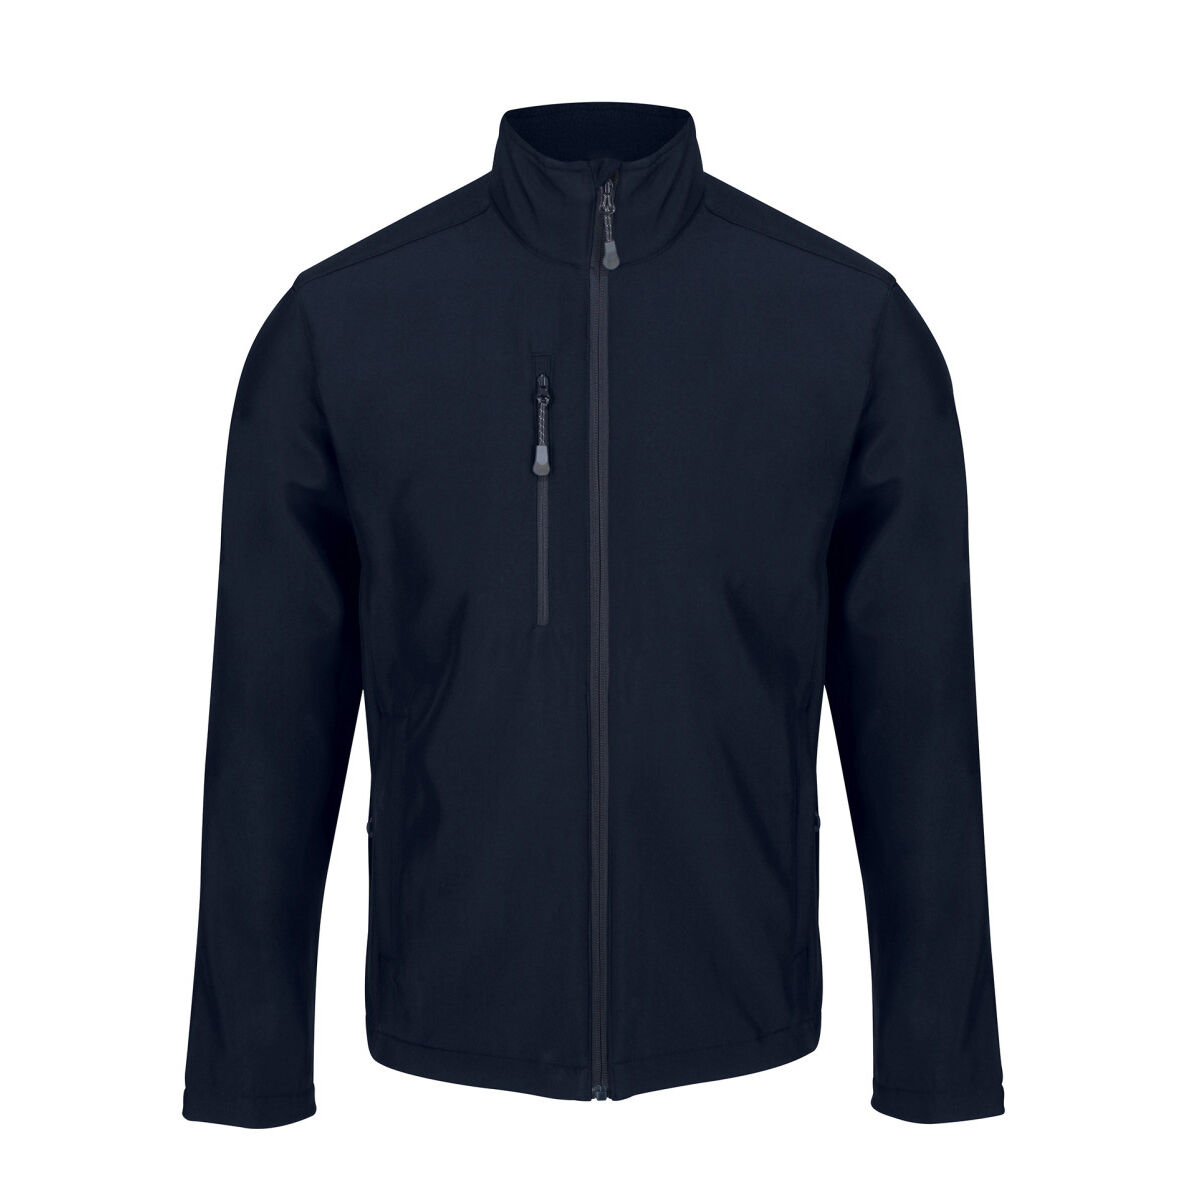 Regatta Recycled Softshell Jacket in Blue